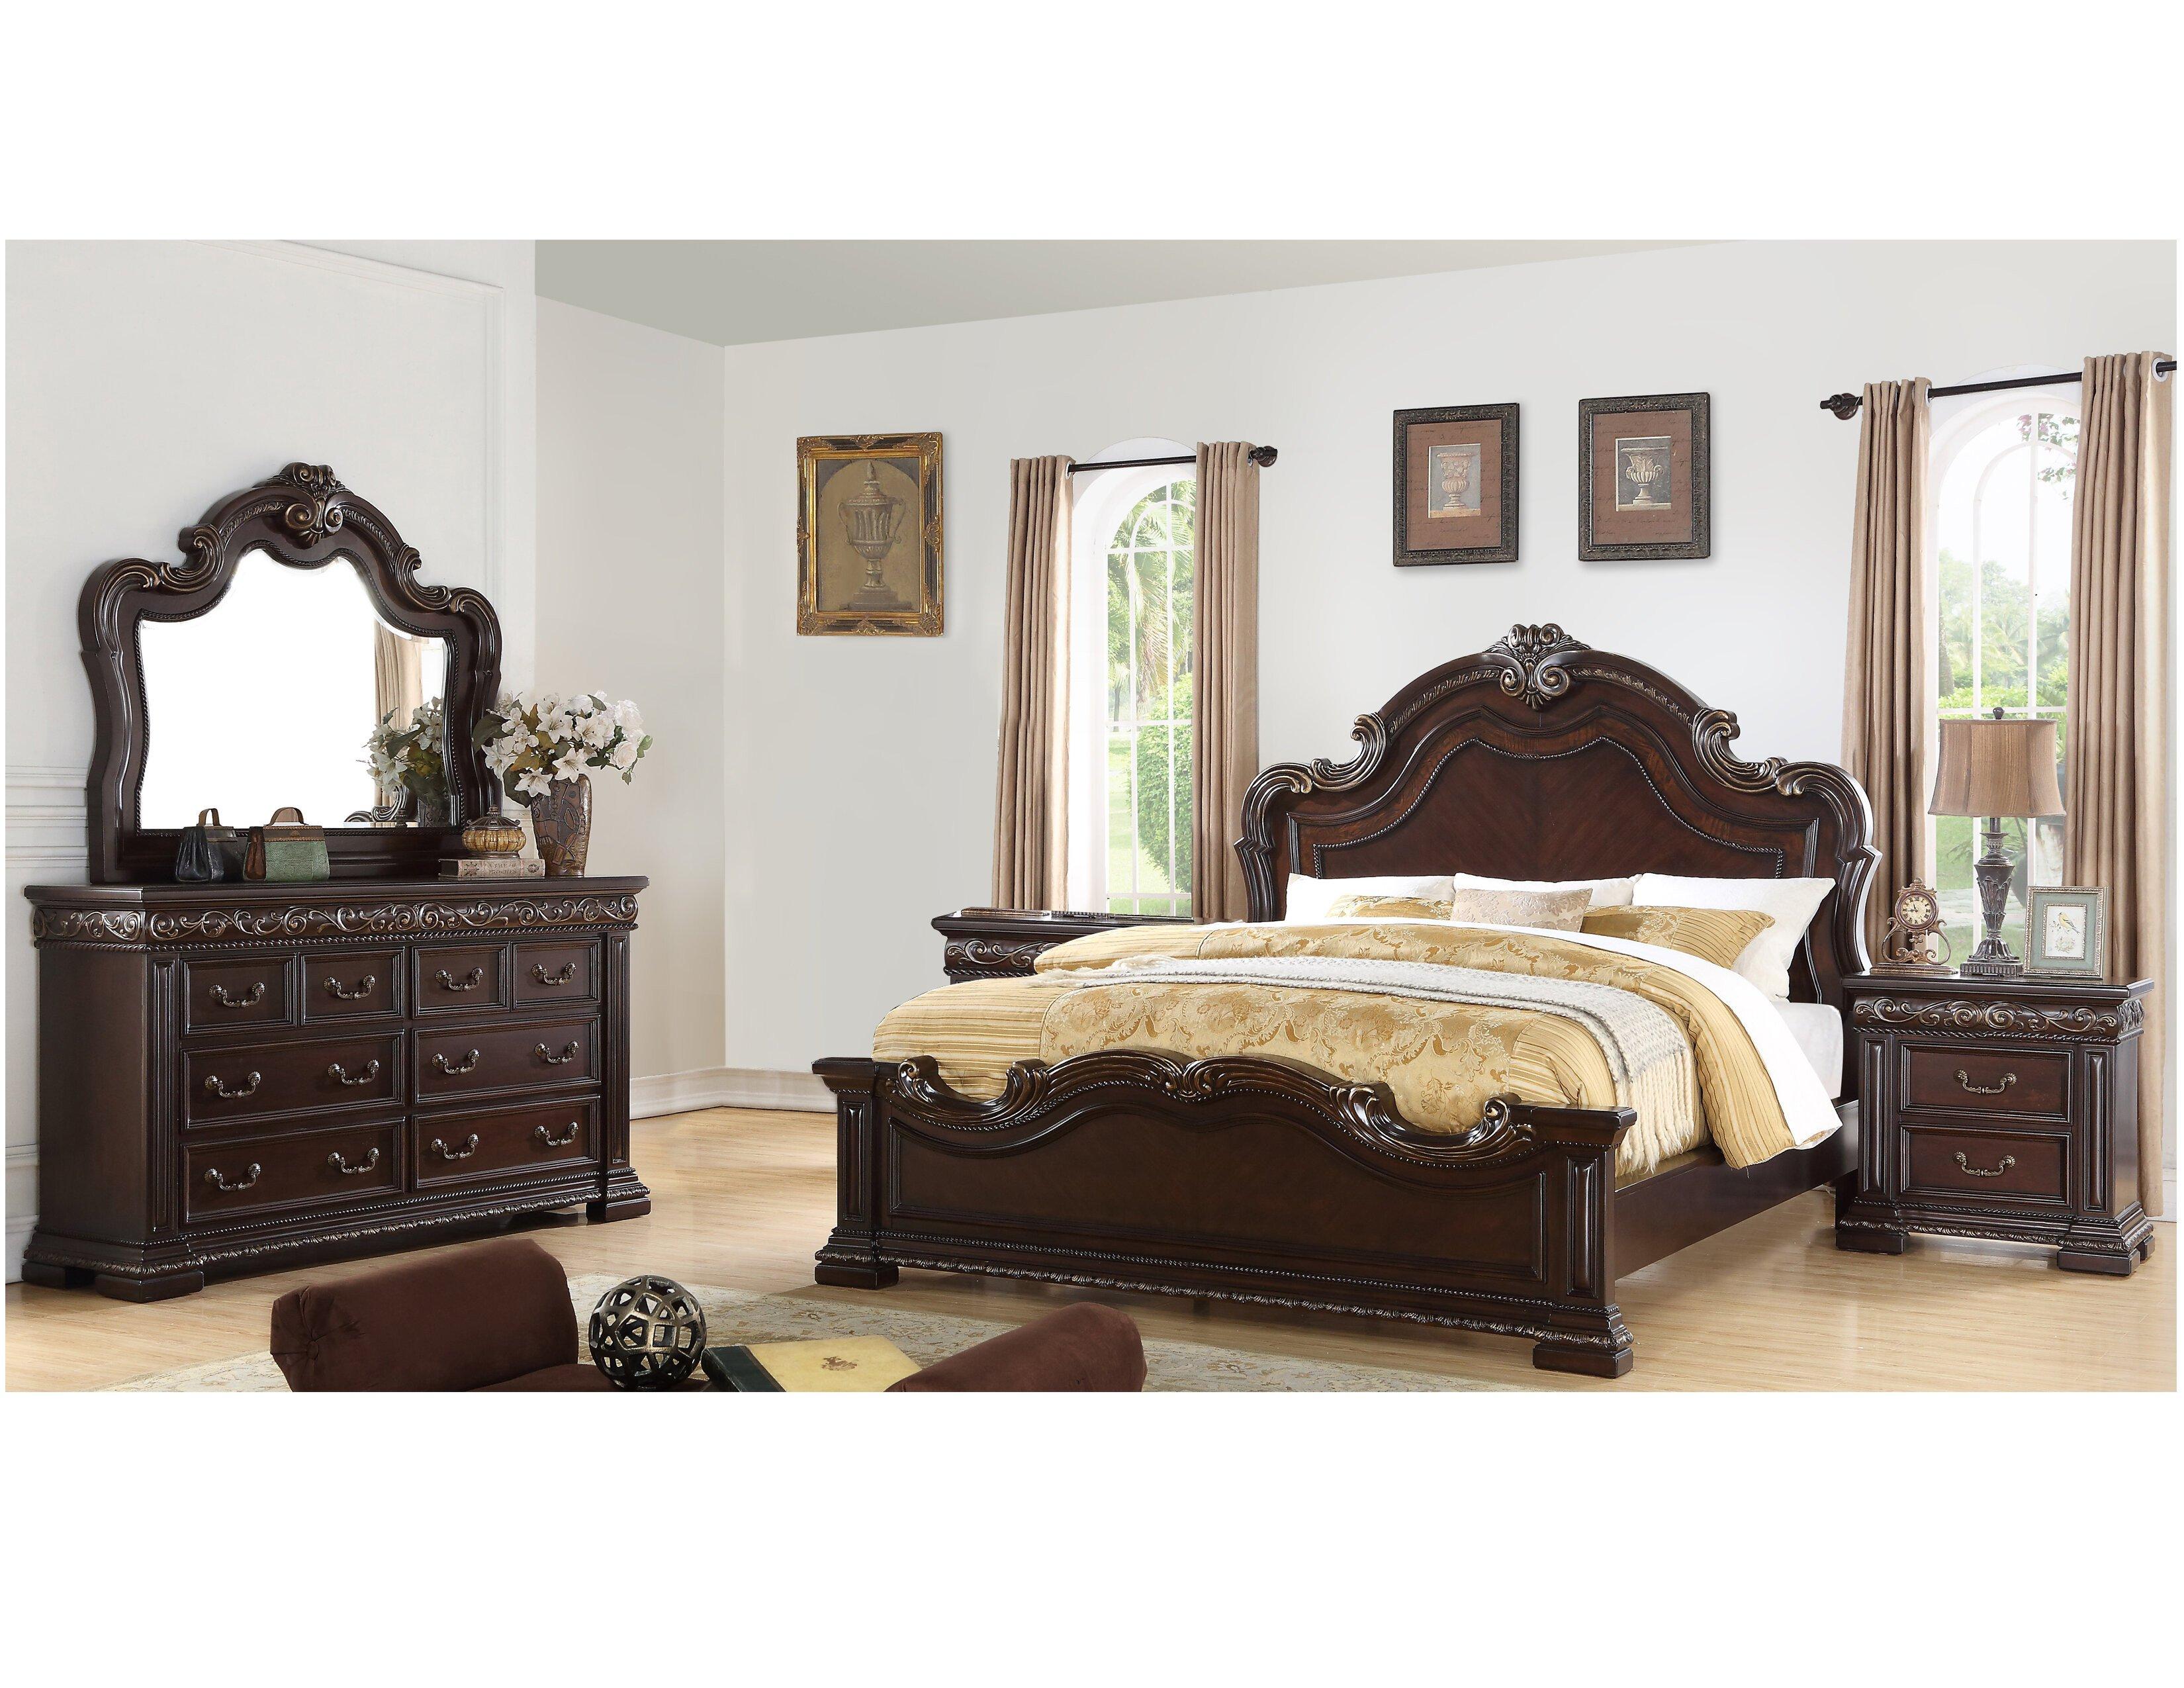 Tufted Headboard Bedroom Set Lovely Bannruod Standard solid Wood 5 Piece Bedroom Set